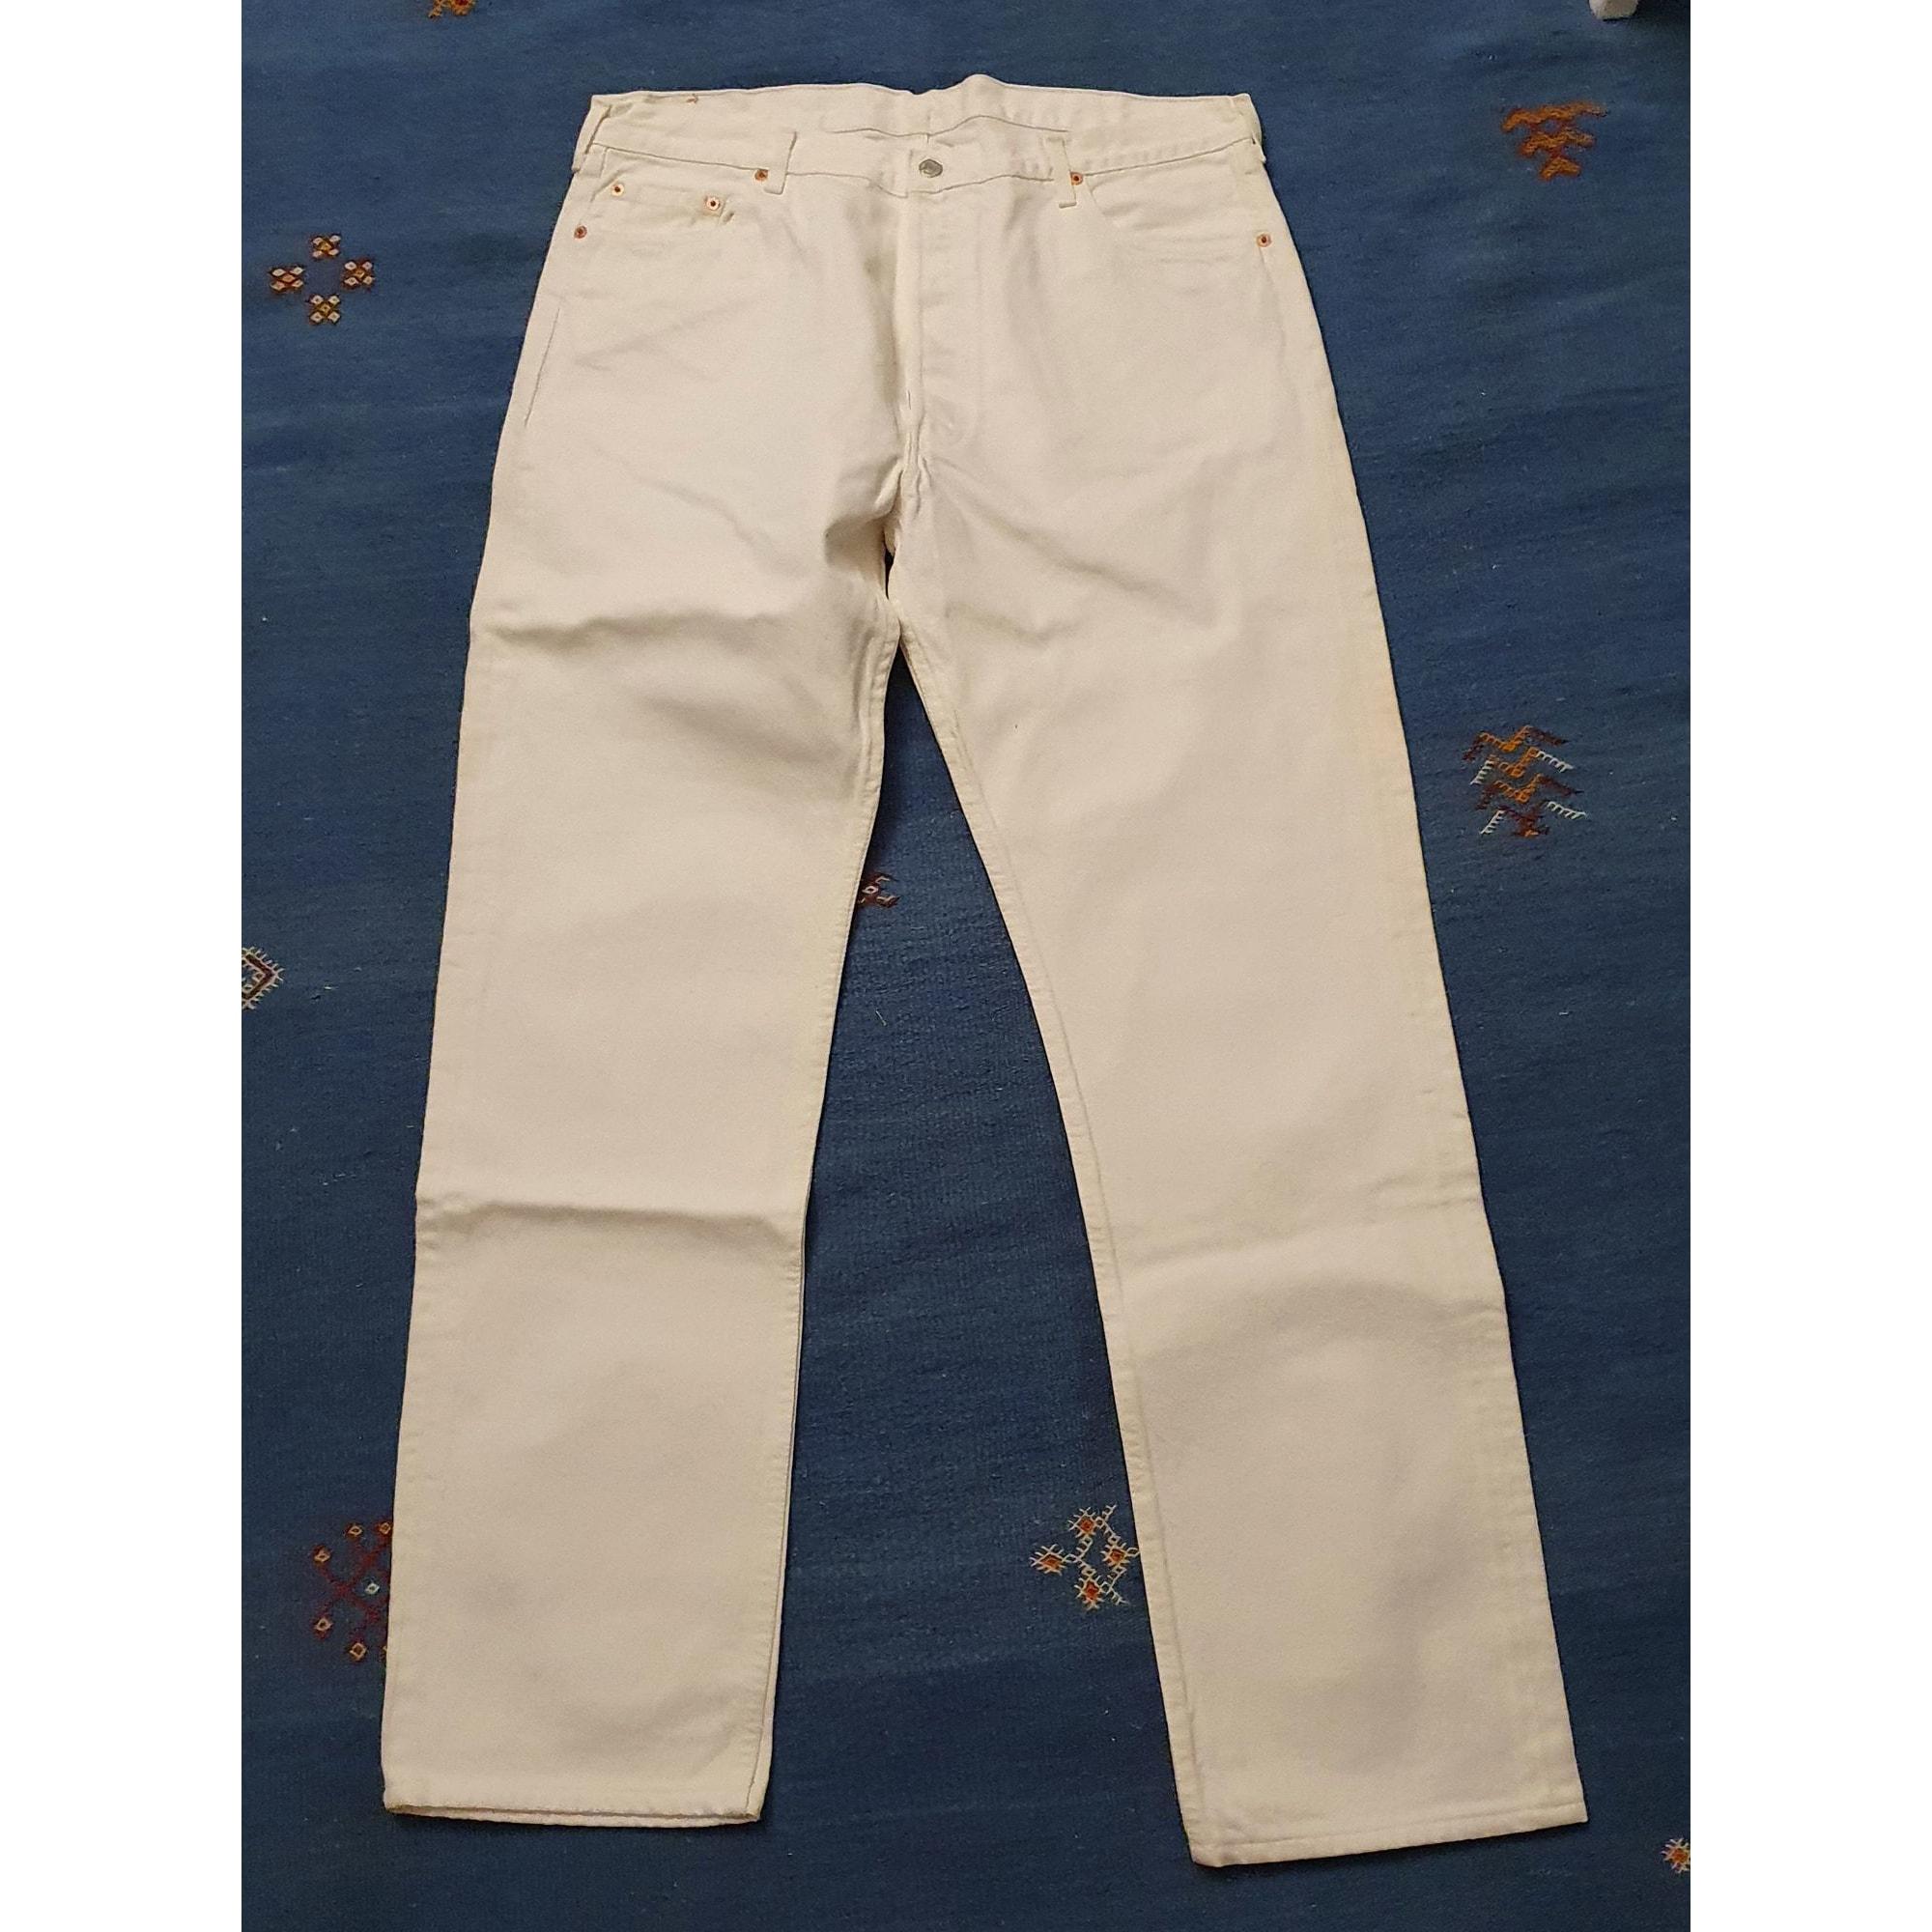 Pantalon large LEVI'S Blanc, blanc cassé, écru